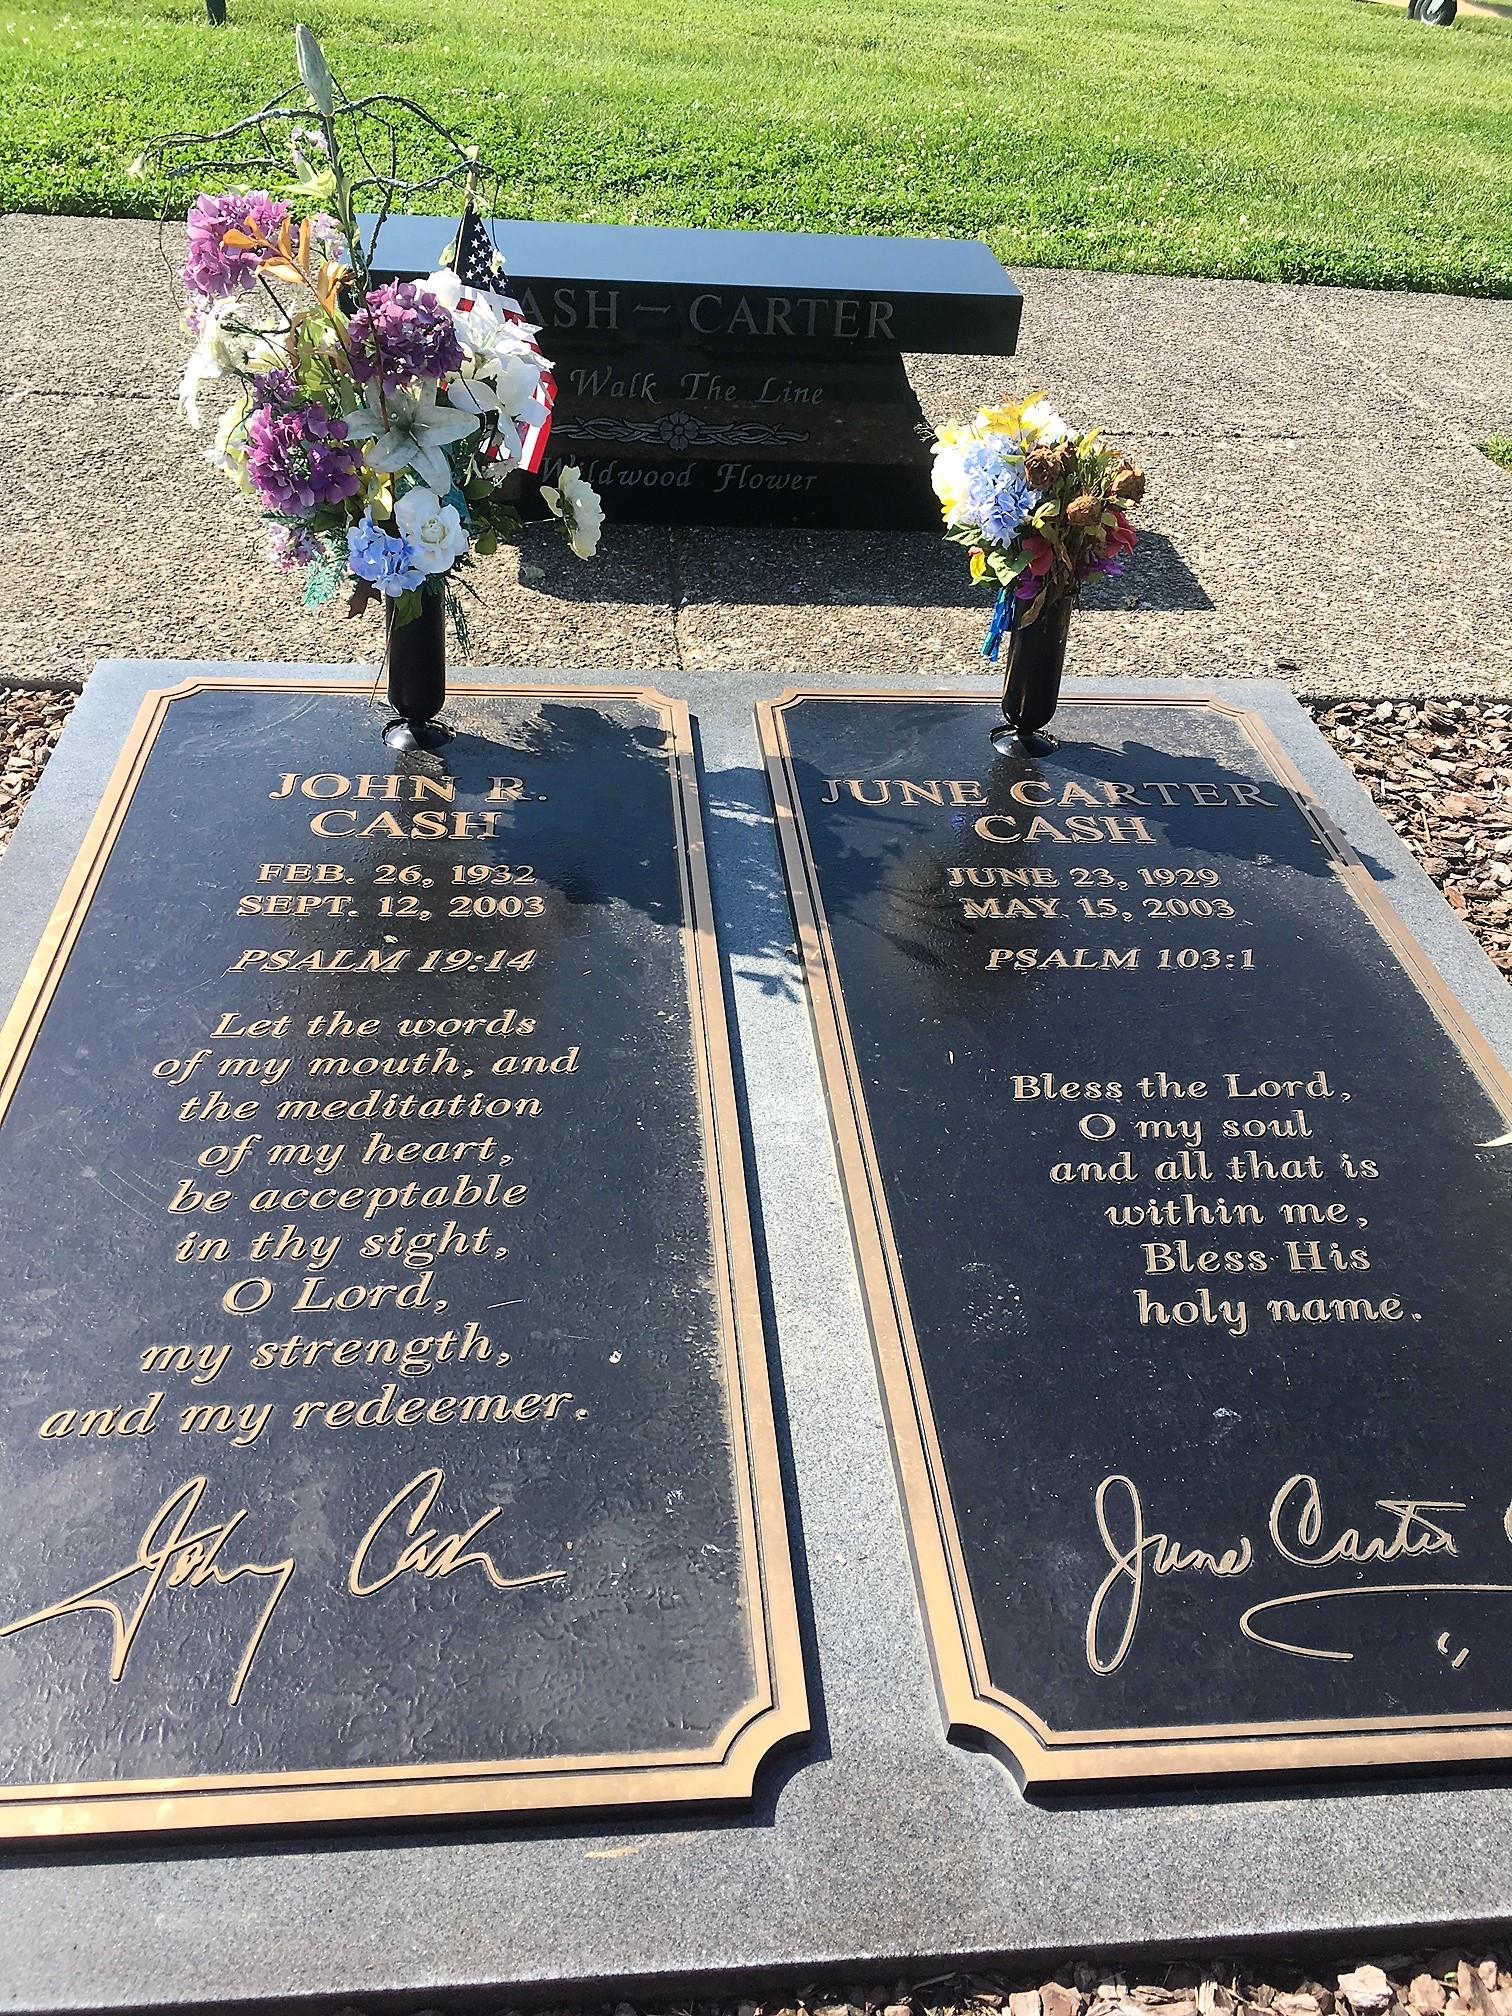 Gravesite Of Johnny Cash & June Carter Cash